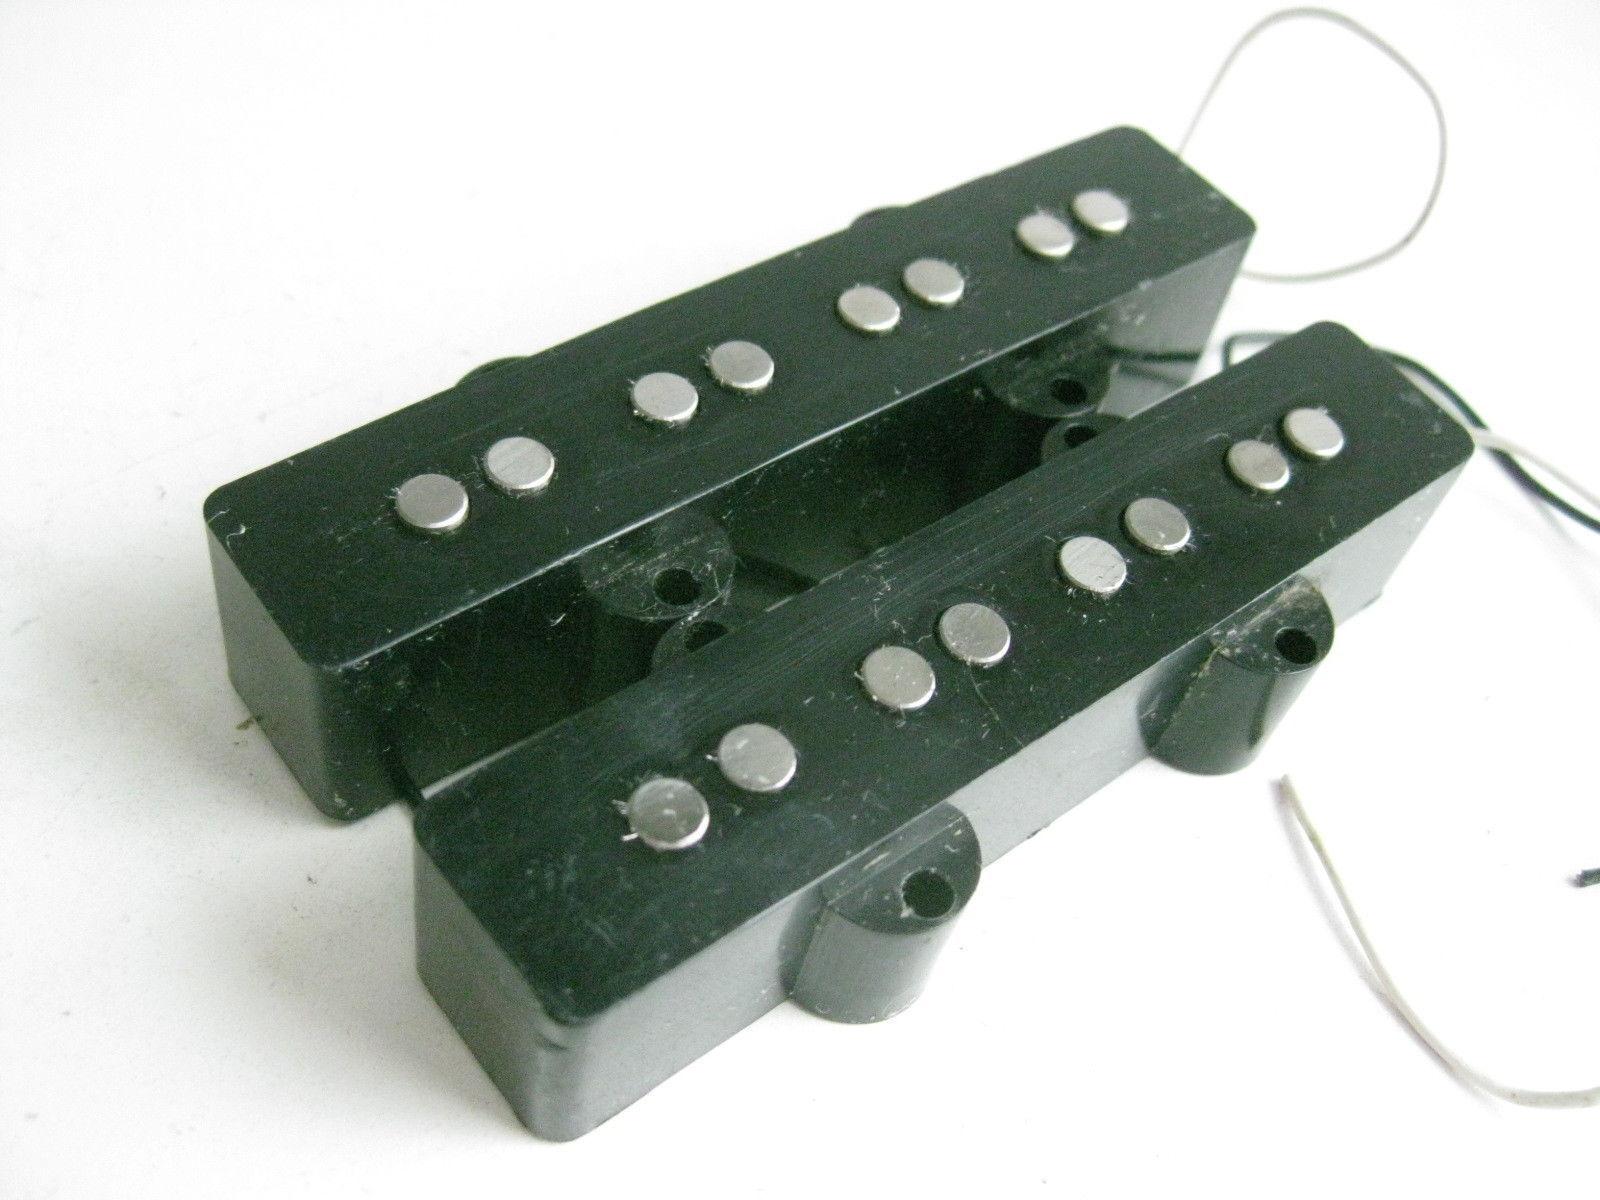 Satz 2 Fender Amerikanisch Jazz Bass Pickups - 0992123000 - Gitarre Jb - Used